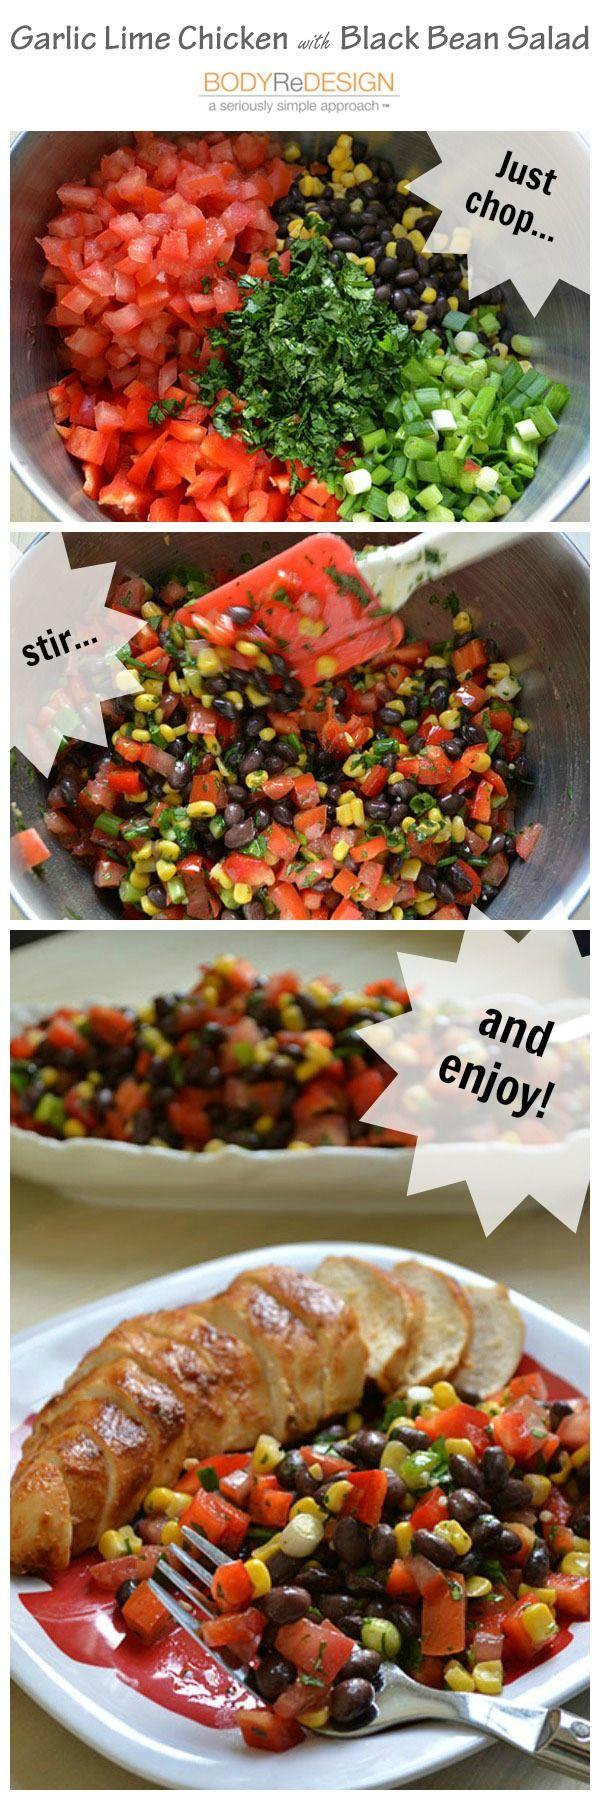 Black Bean and Corn Salad Recipe from https://bodyredesignonline.com/garlic-lime-chicken-with-black-bean-salad/